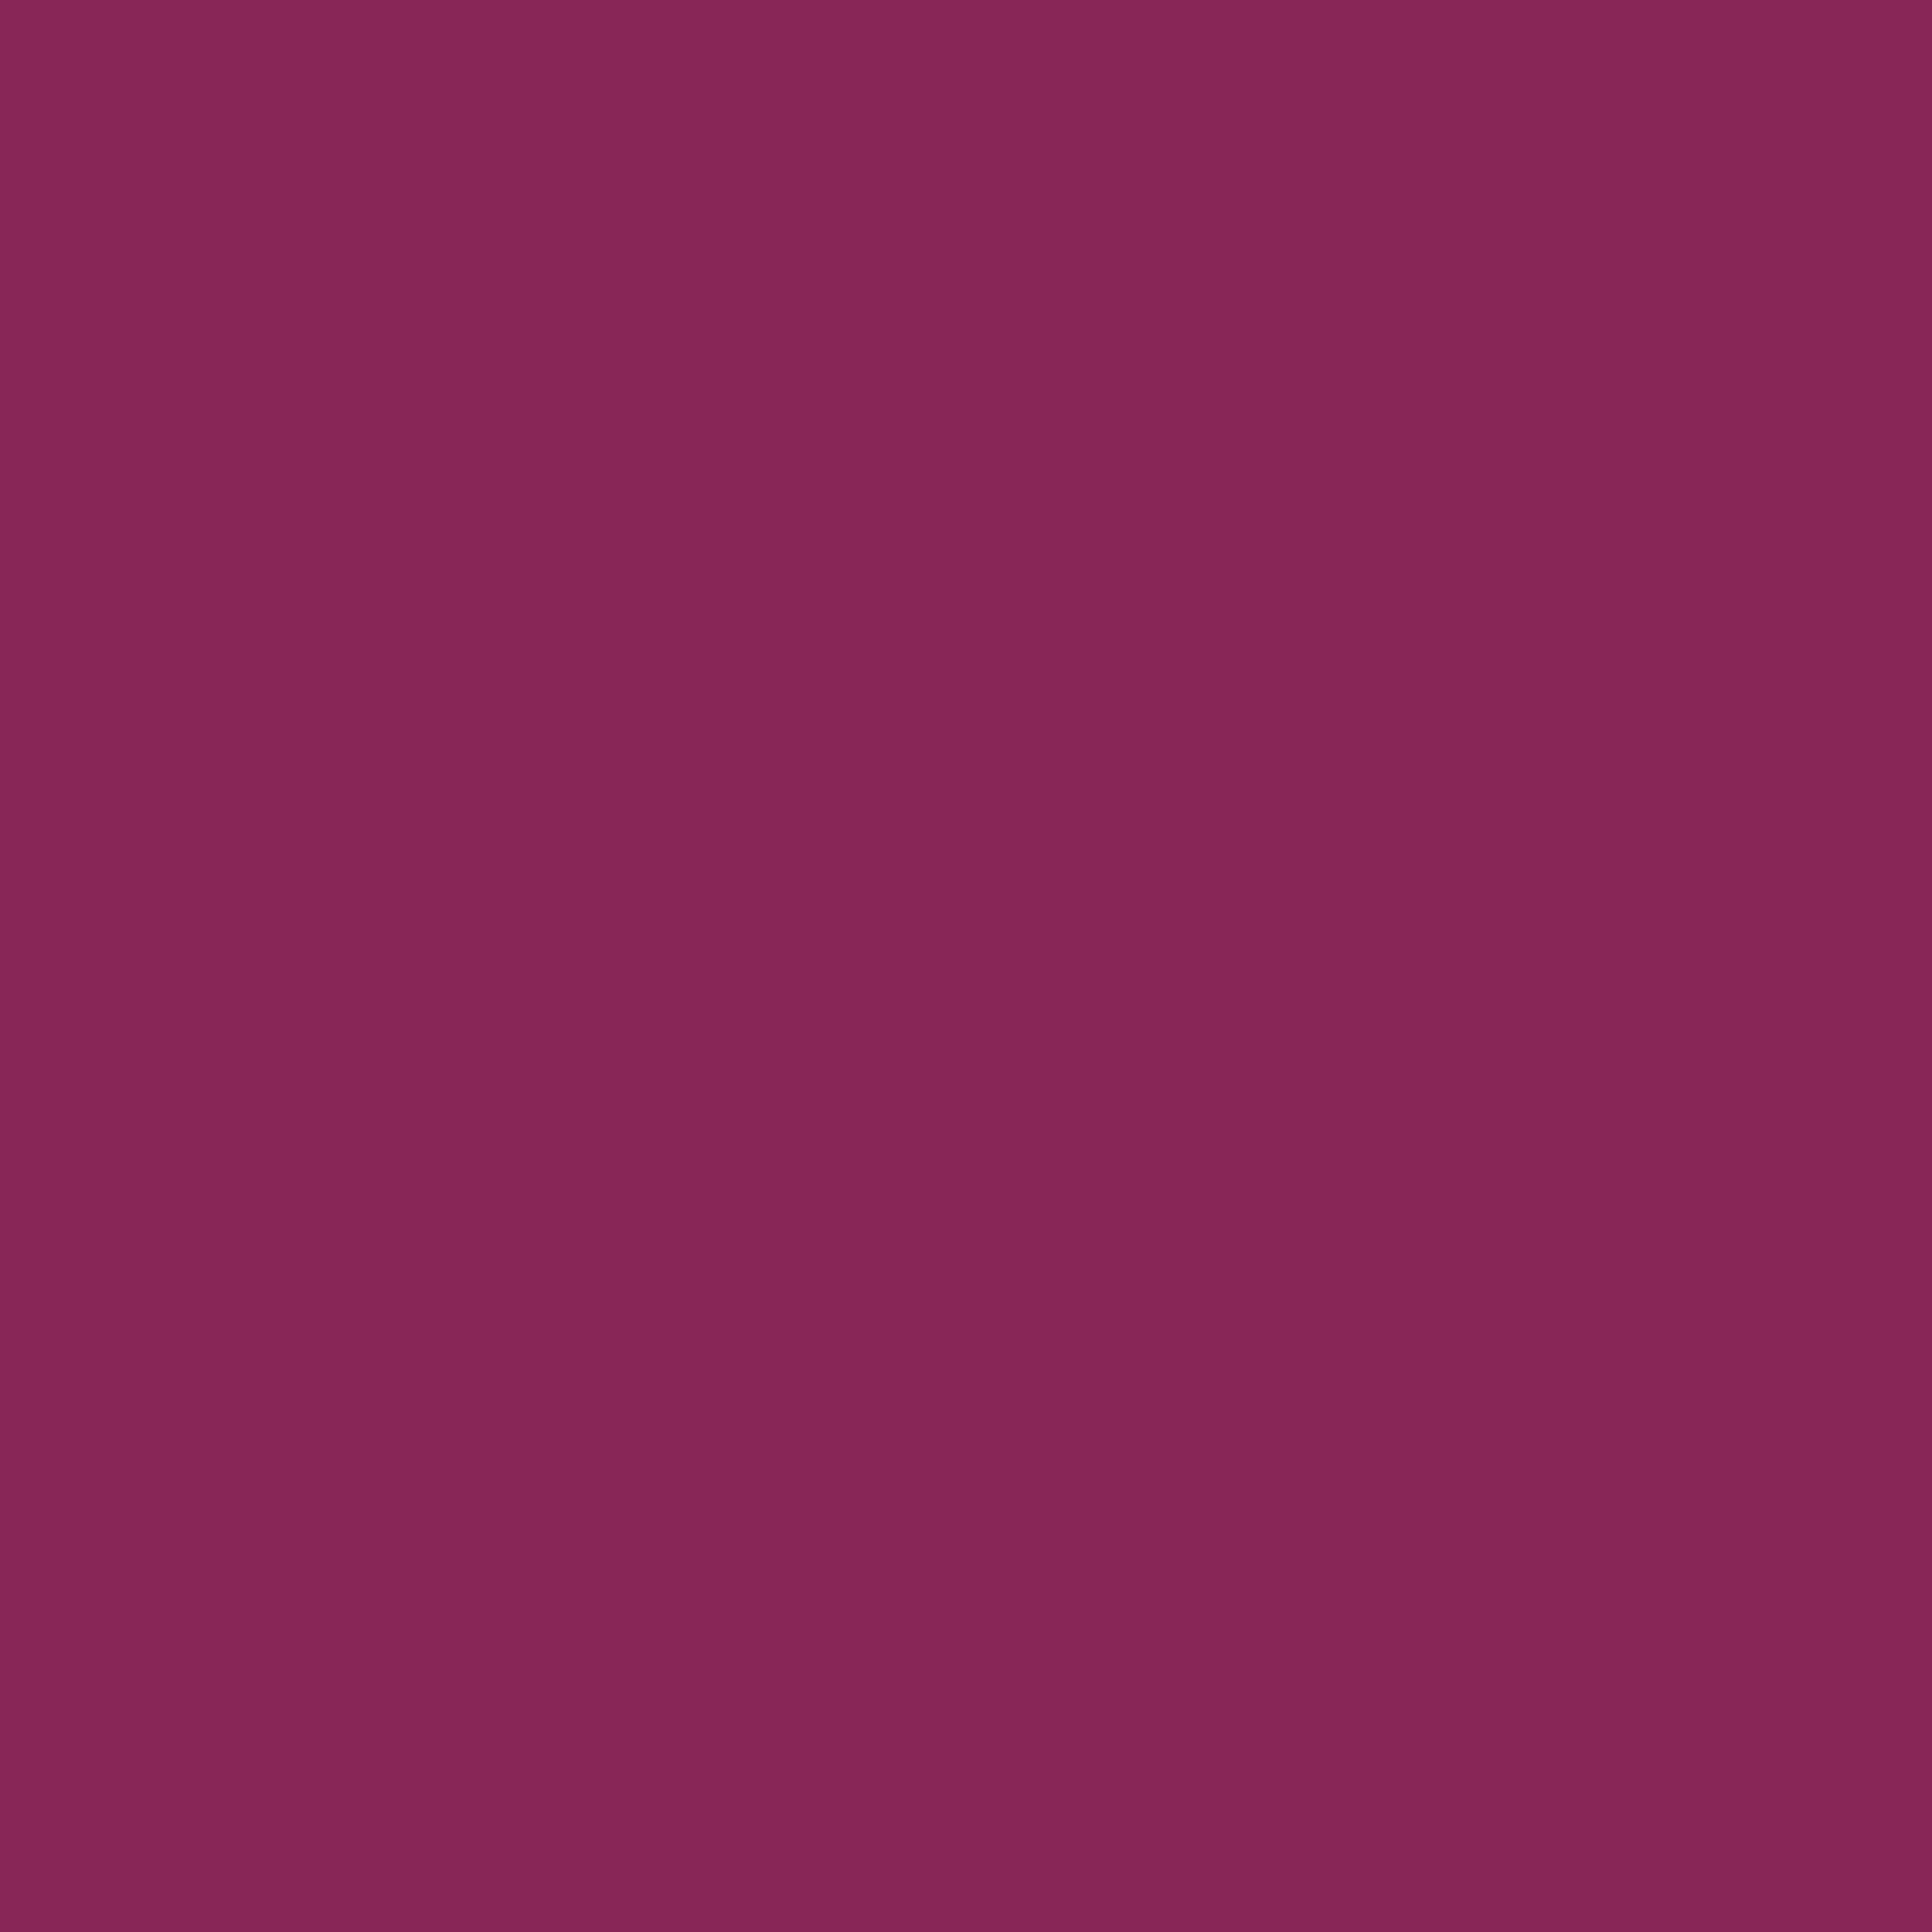 2732x2732 Dark Raspberry Solid Color Background